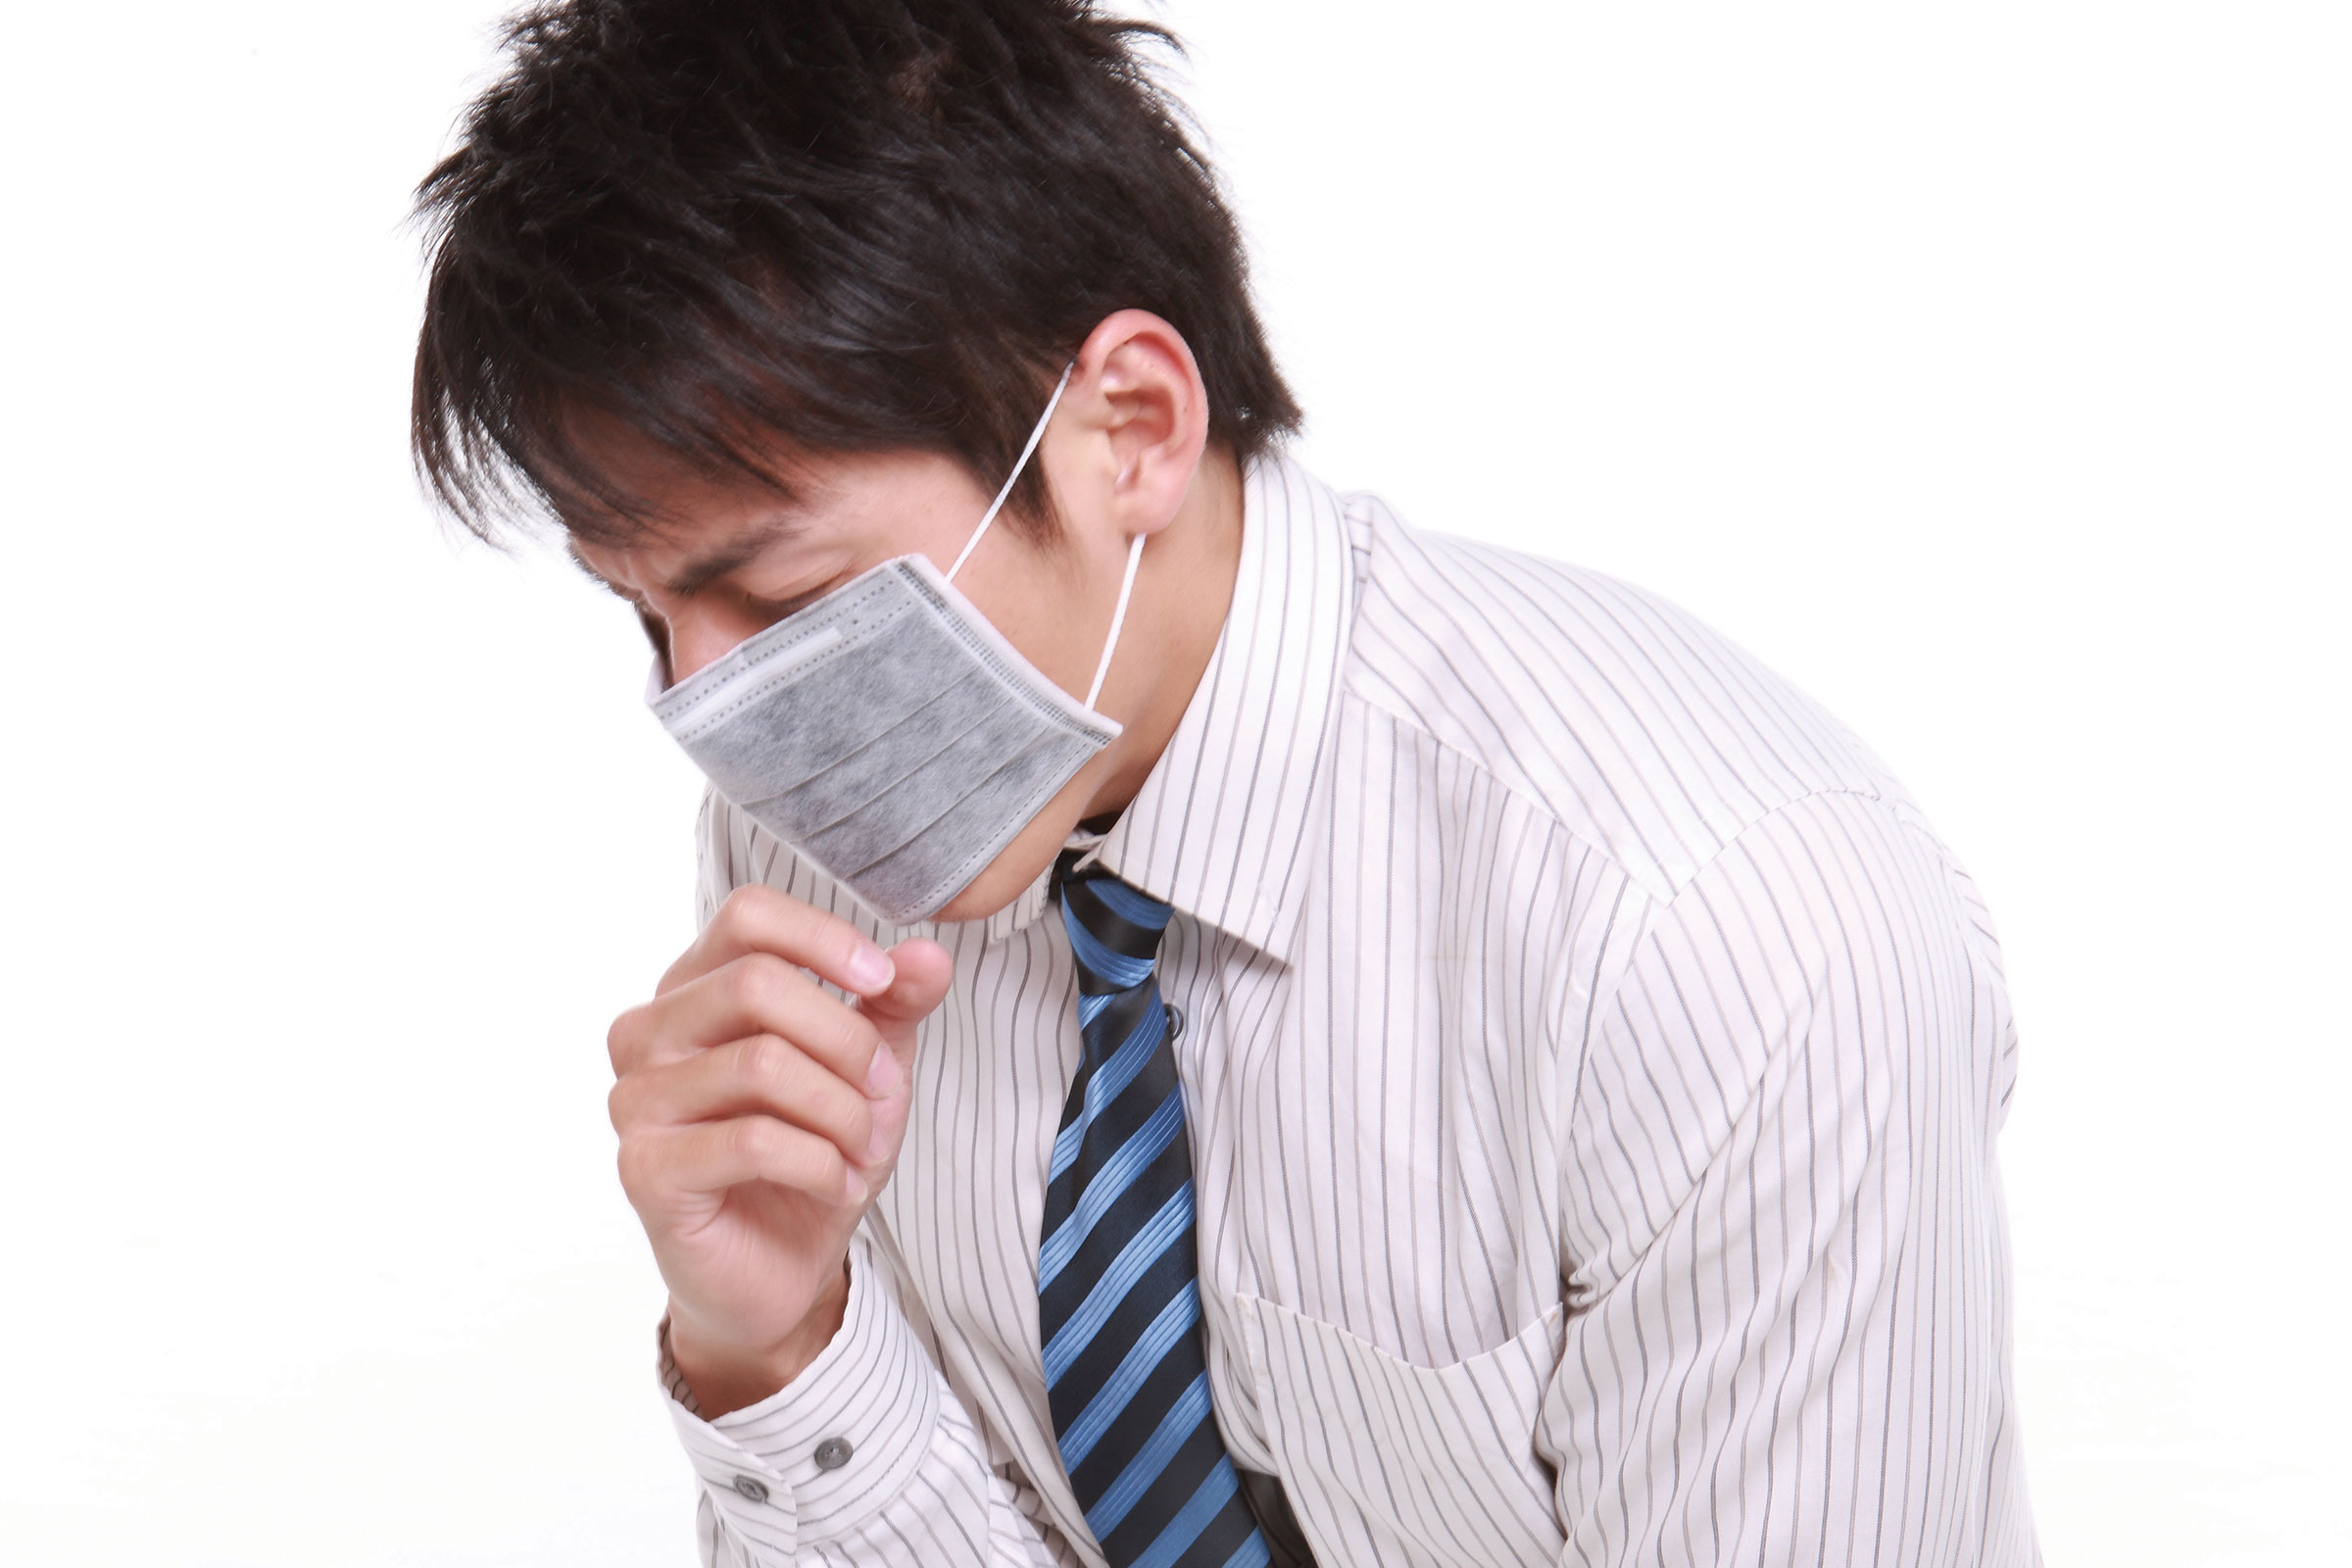 Respiratory Hygiene Tools